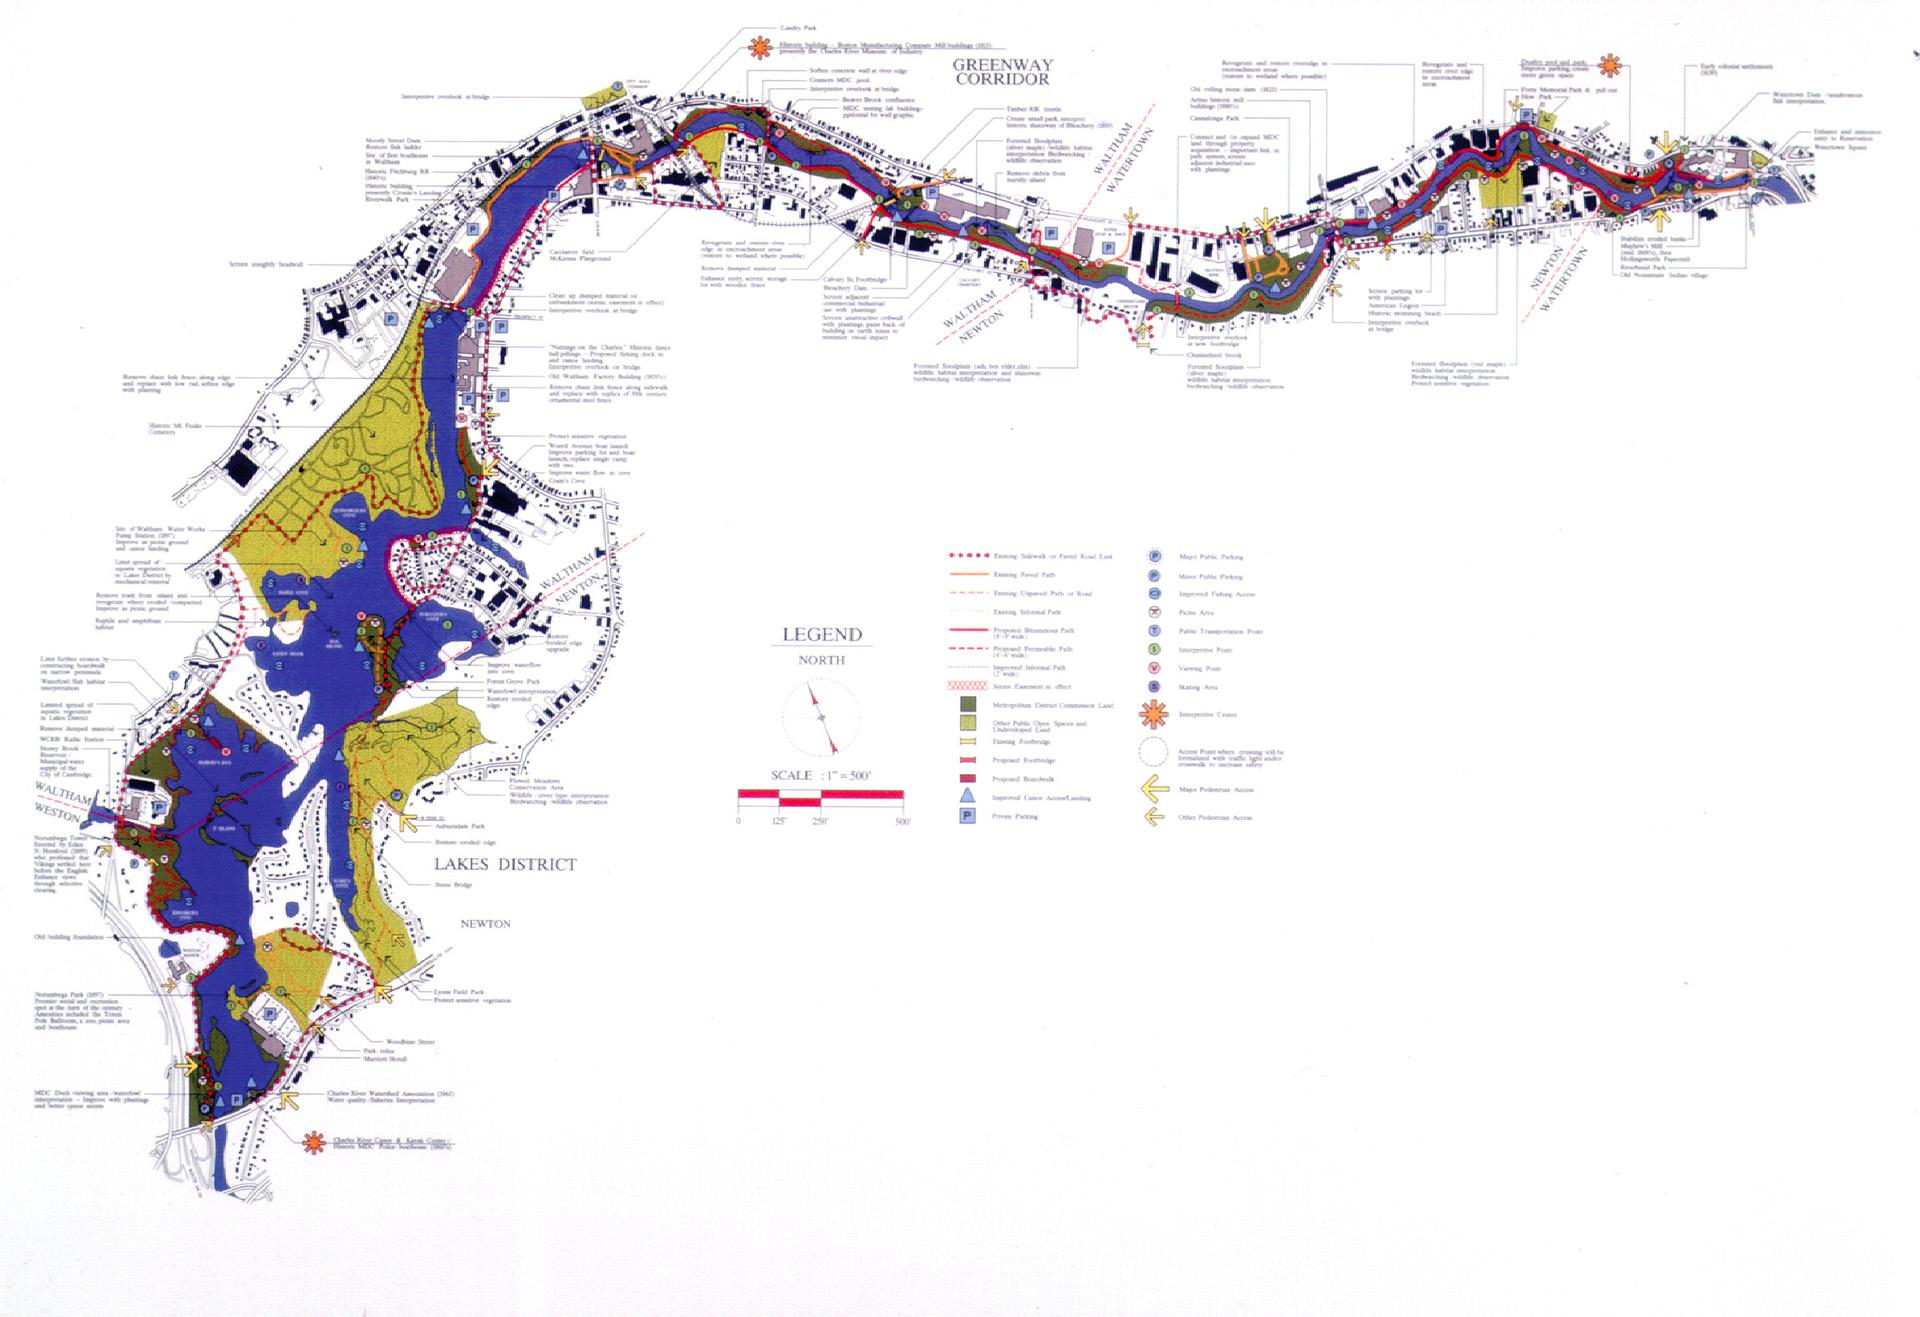 upper charles site plan